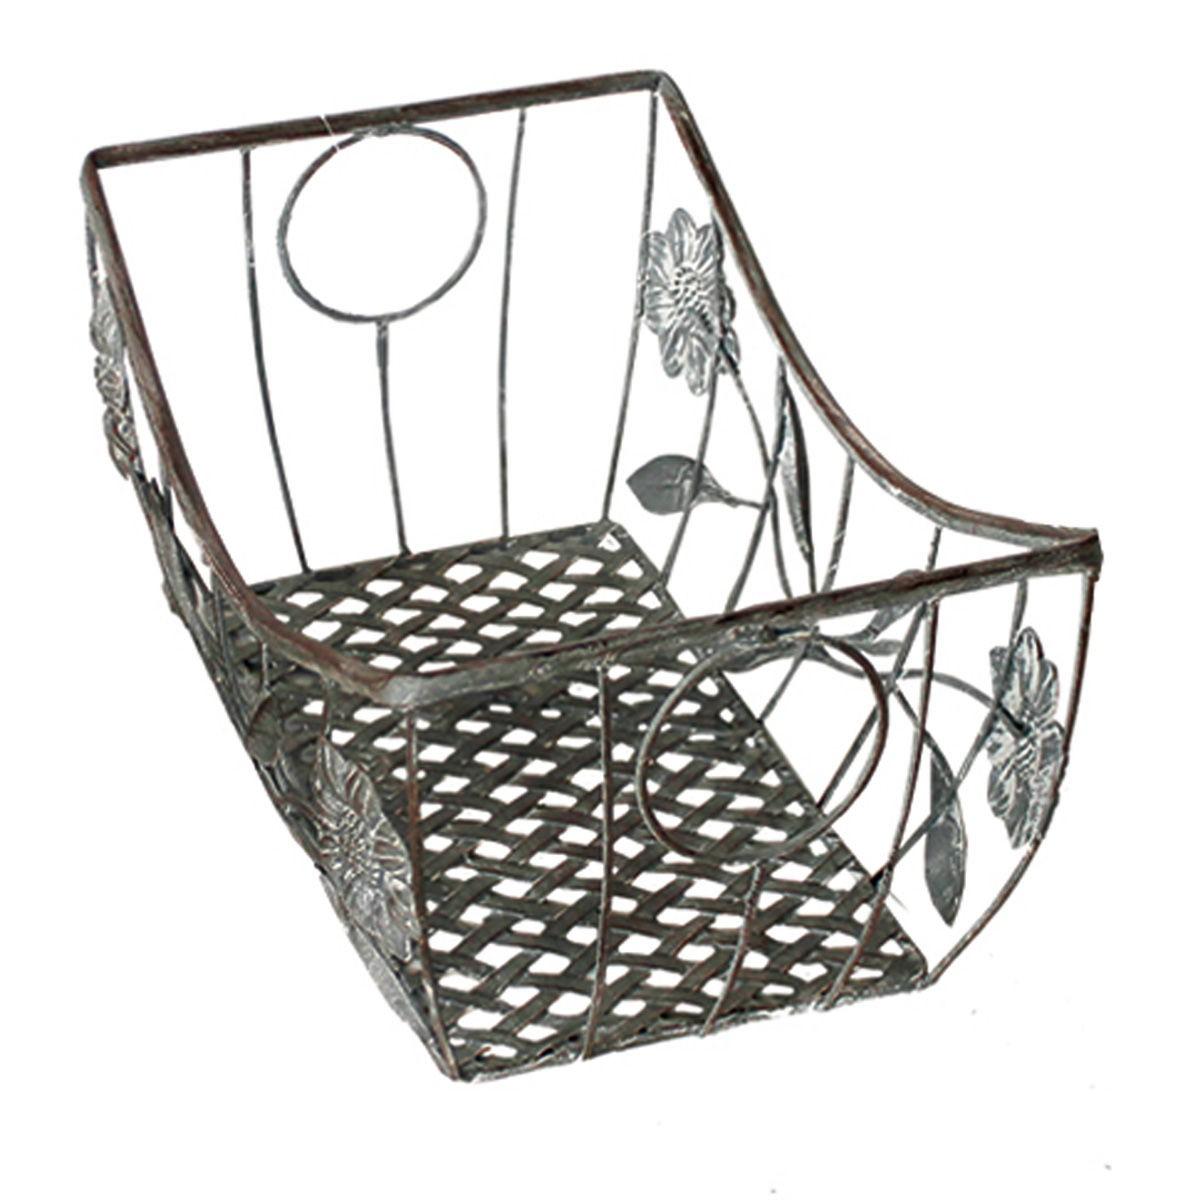 korb dekok rbe set 3tlg eckig antik grau metall dekokorb pflanzkorb korbset. Black Bedroom Furniture Sets. Home Design Ideas